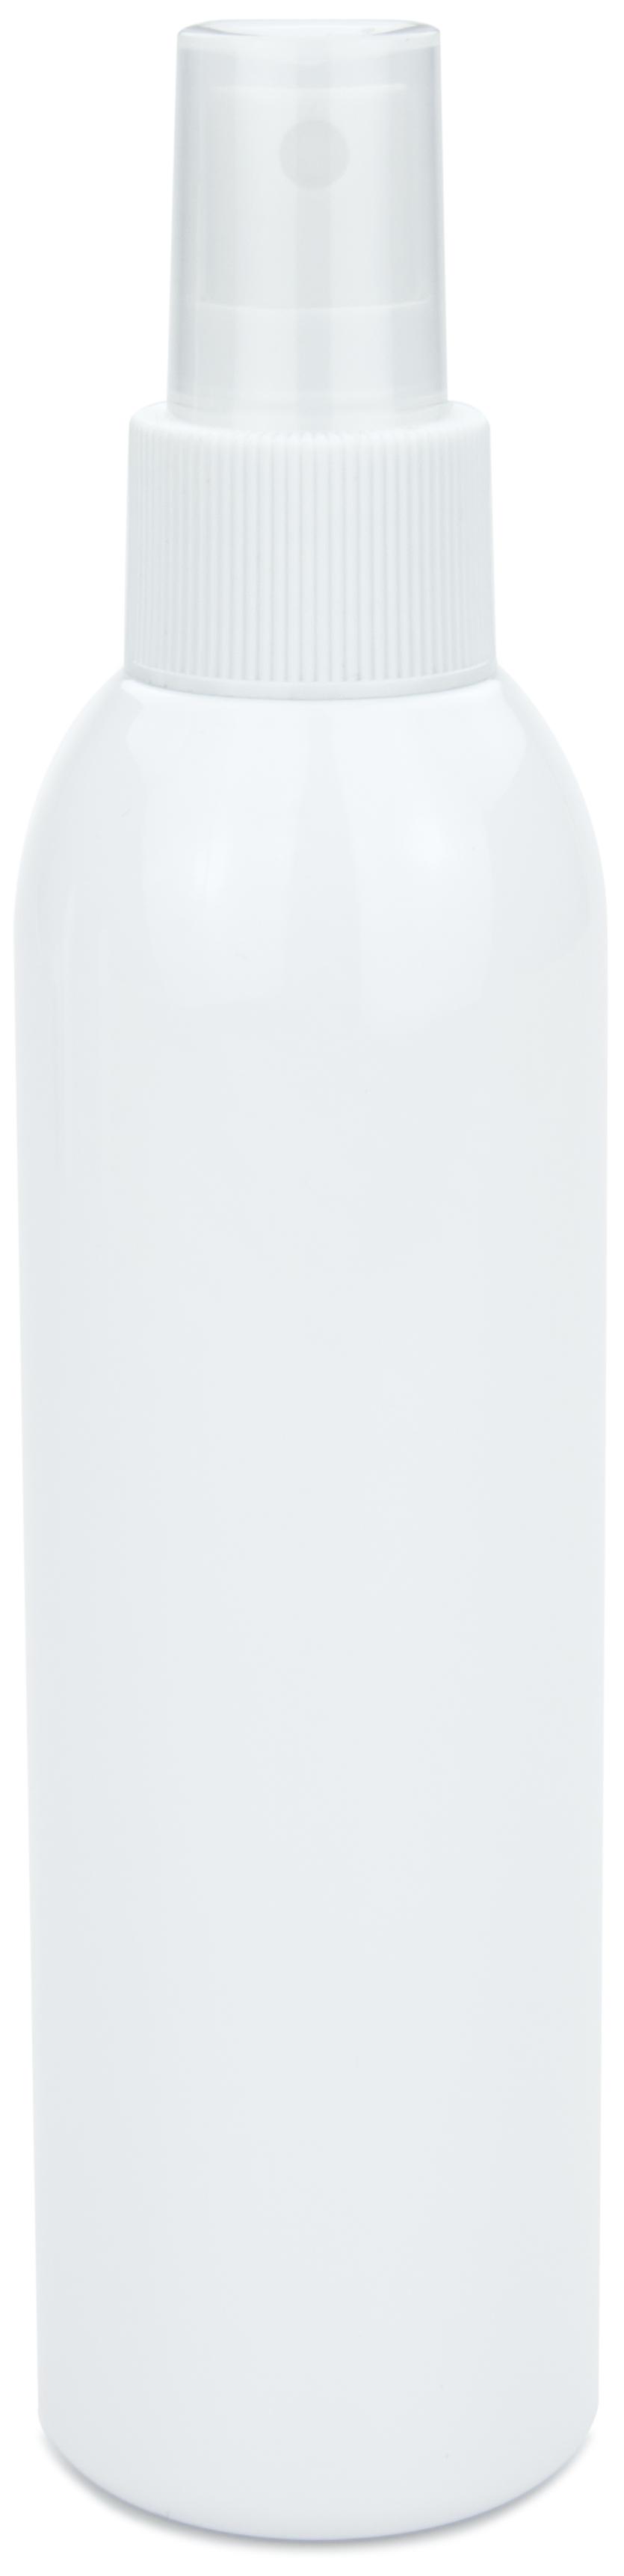 pet flasche aida 200 ml weiss inkl spray zerst uber pumpe basic 24 410 weiss. Black Bedroom Furniture Sets. Home Design Ideas